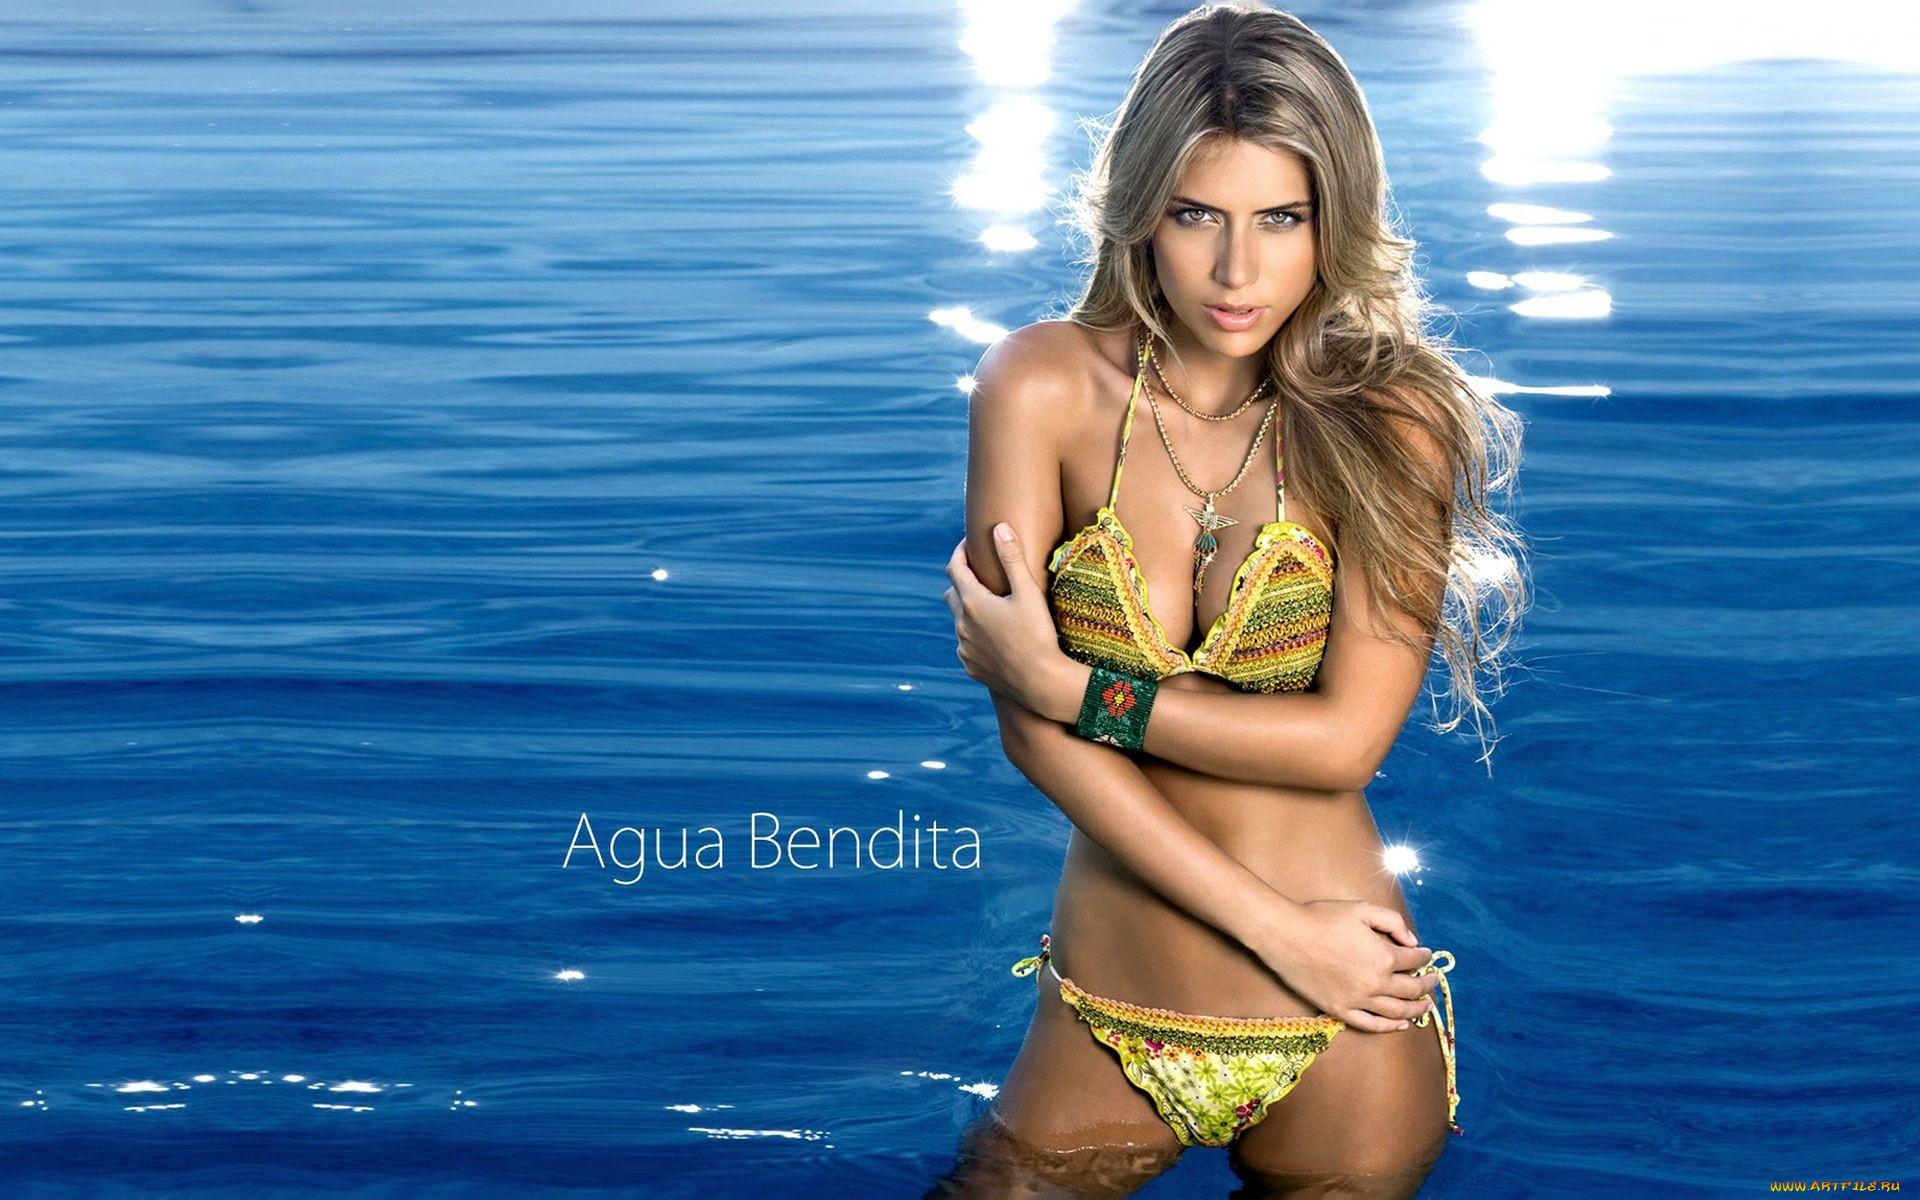 Фото девушки в воде 11 фотография